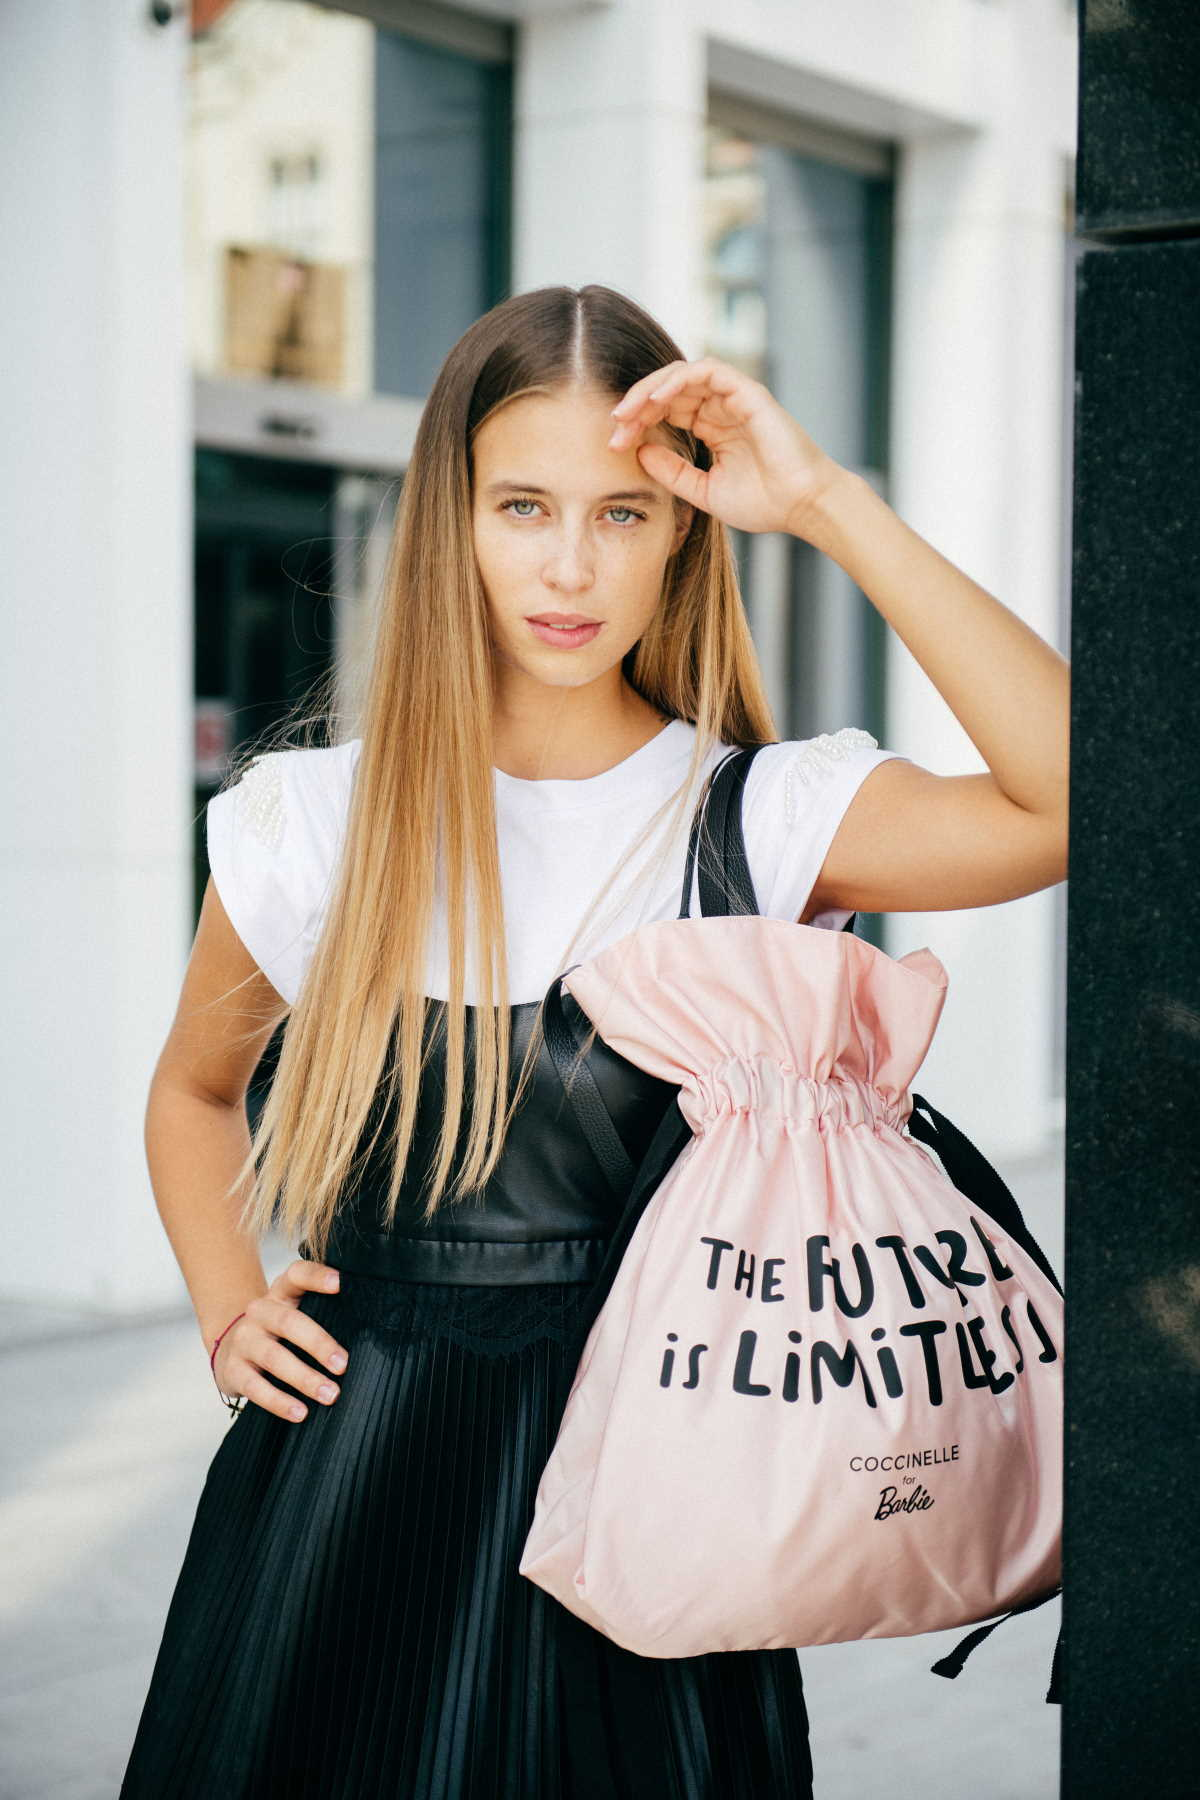 Ekskluzivno u Karla trgovinama - društveno odgovorna kolekcija: Coccinelle for Barbie